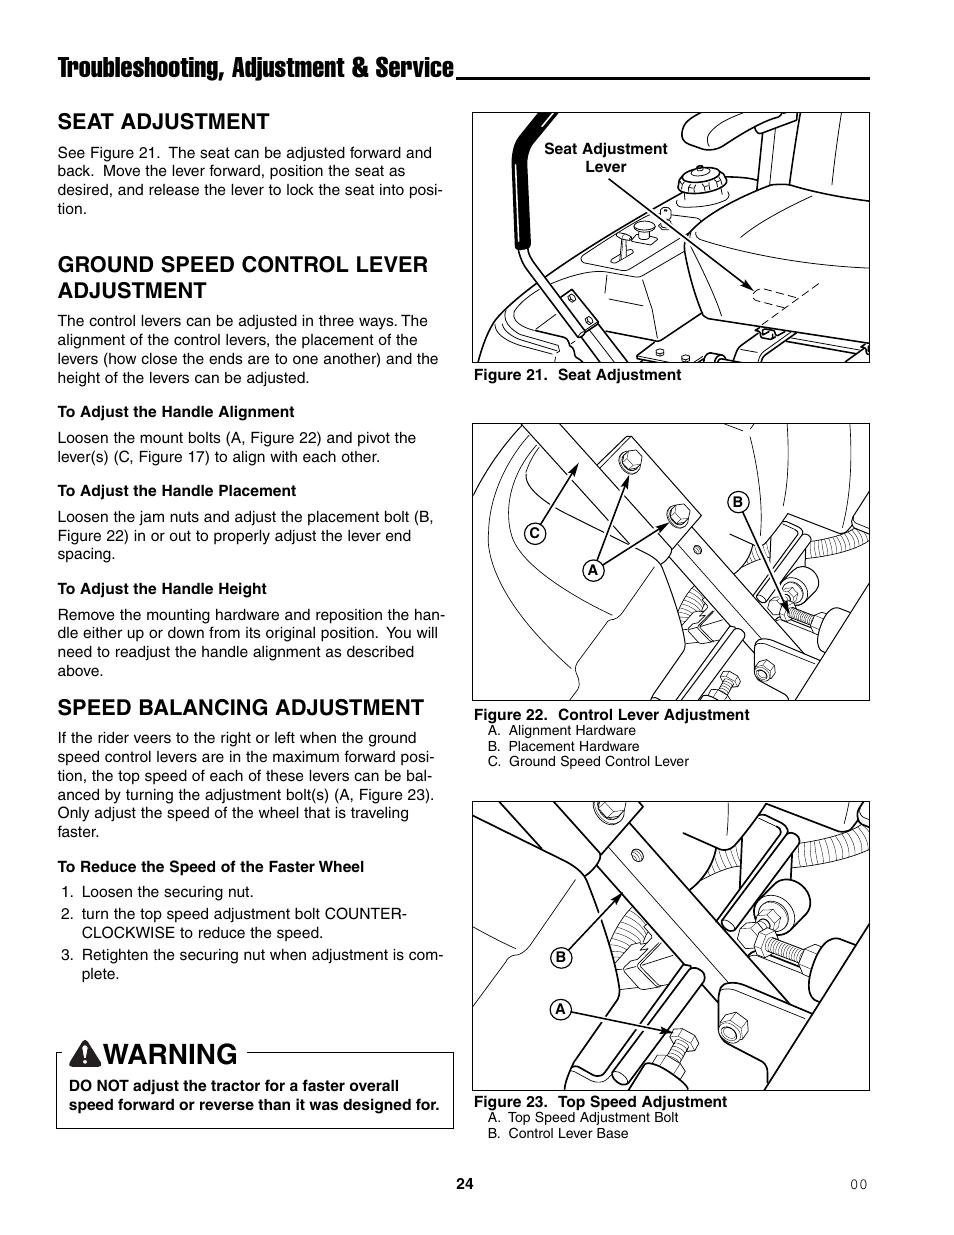 Troubleshooting, adjustment & service, Warning, Seat